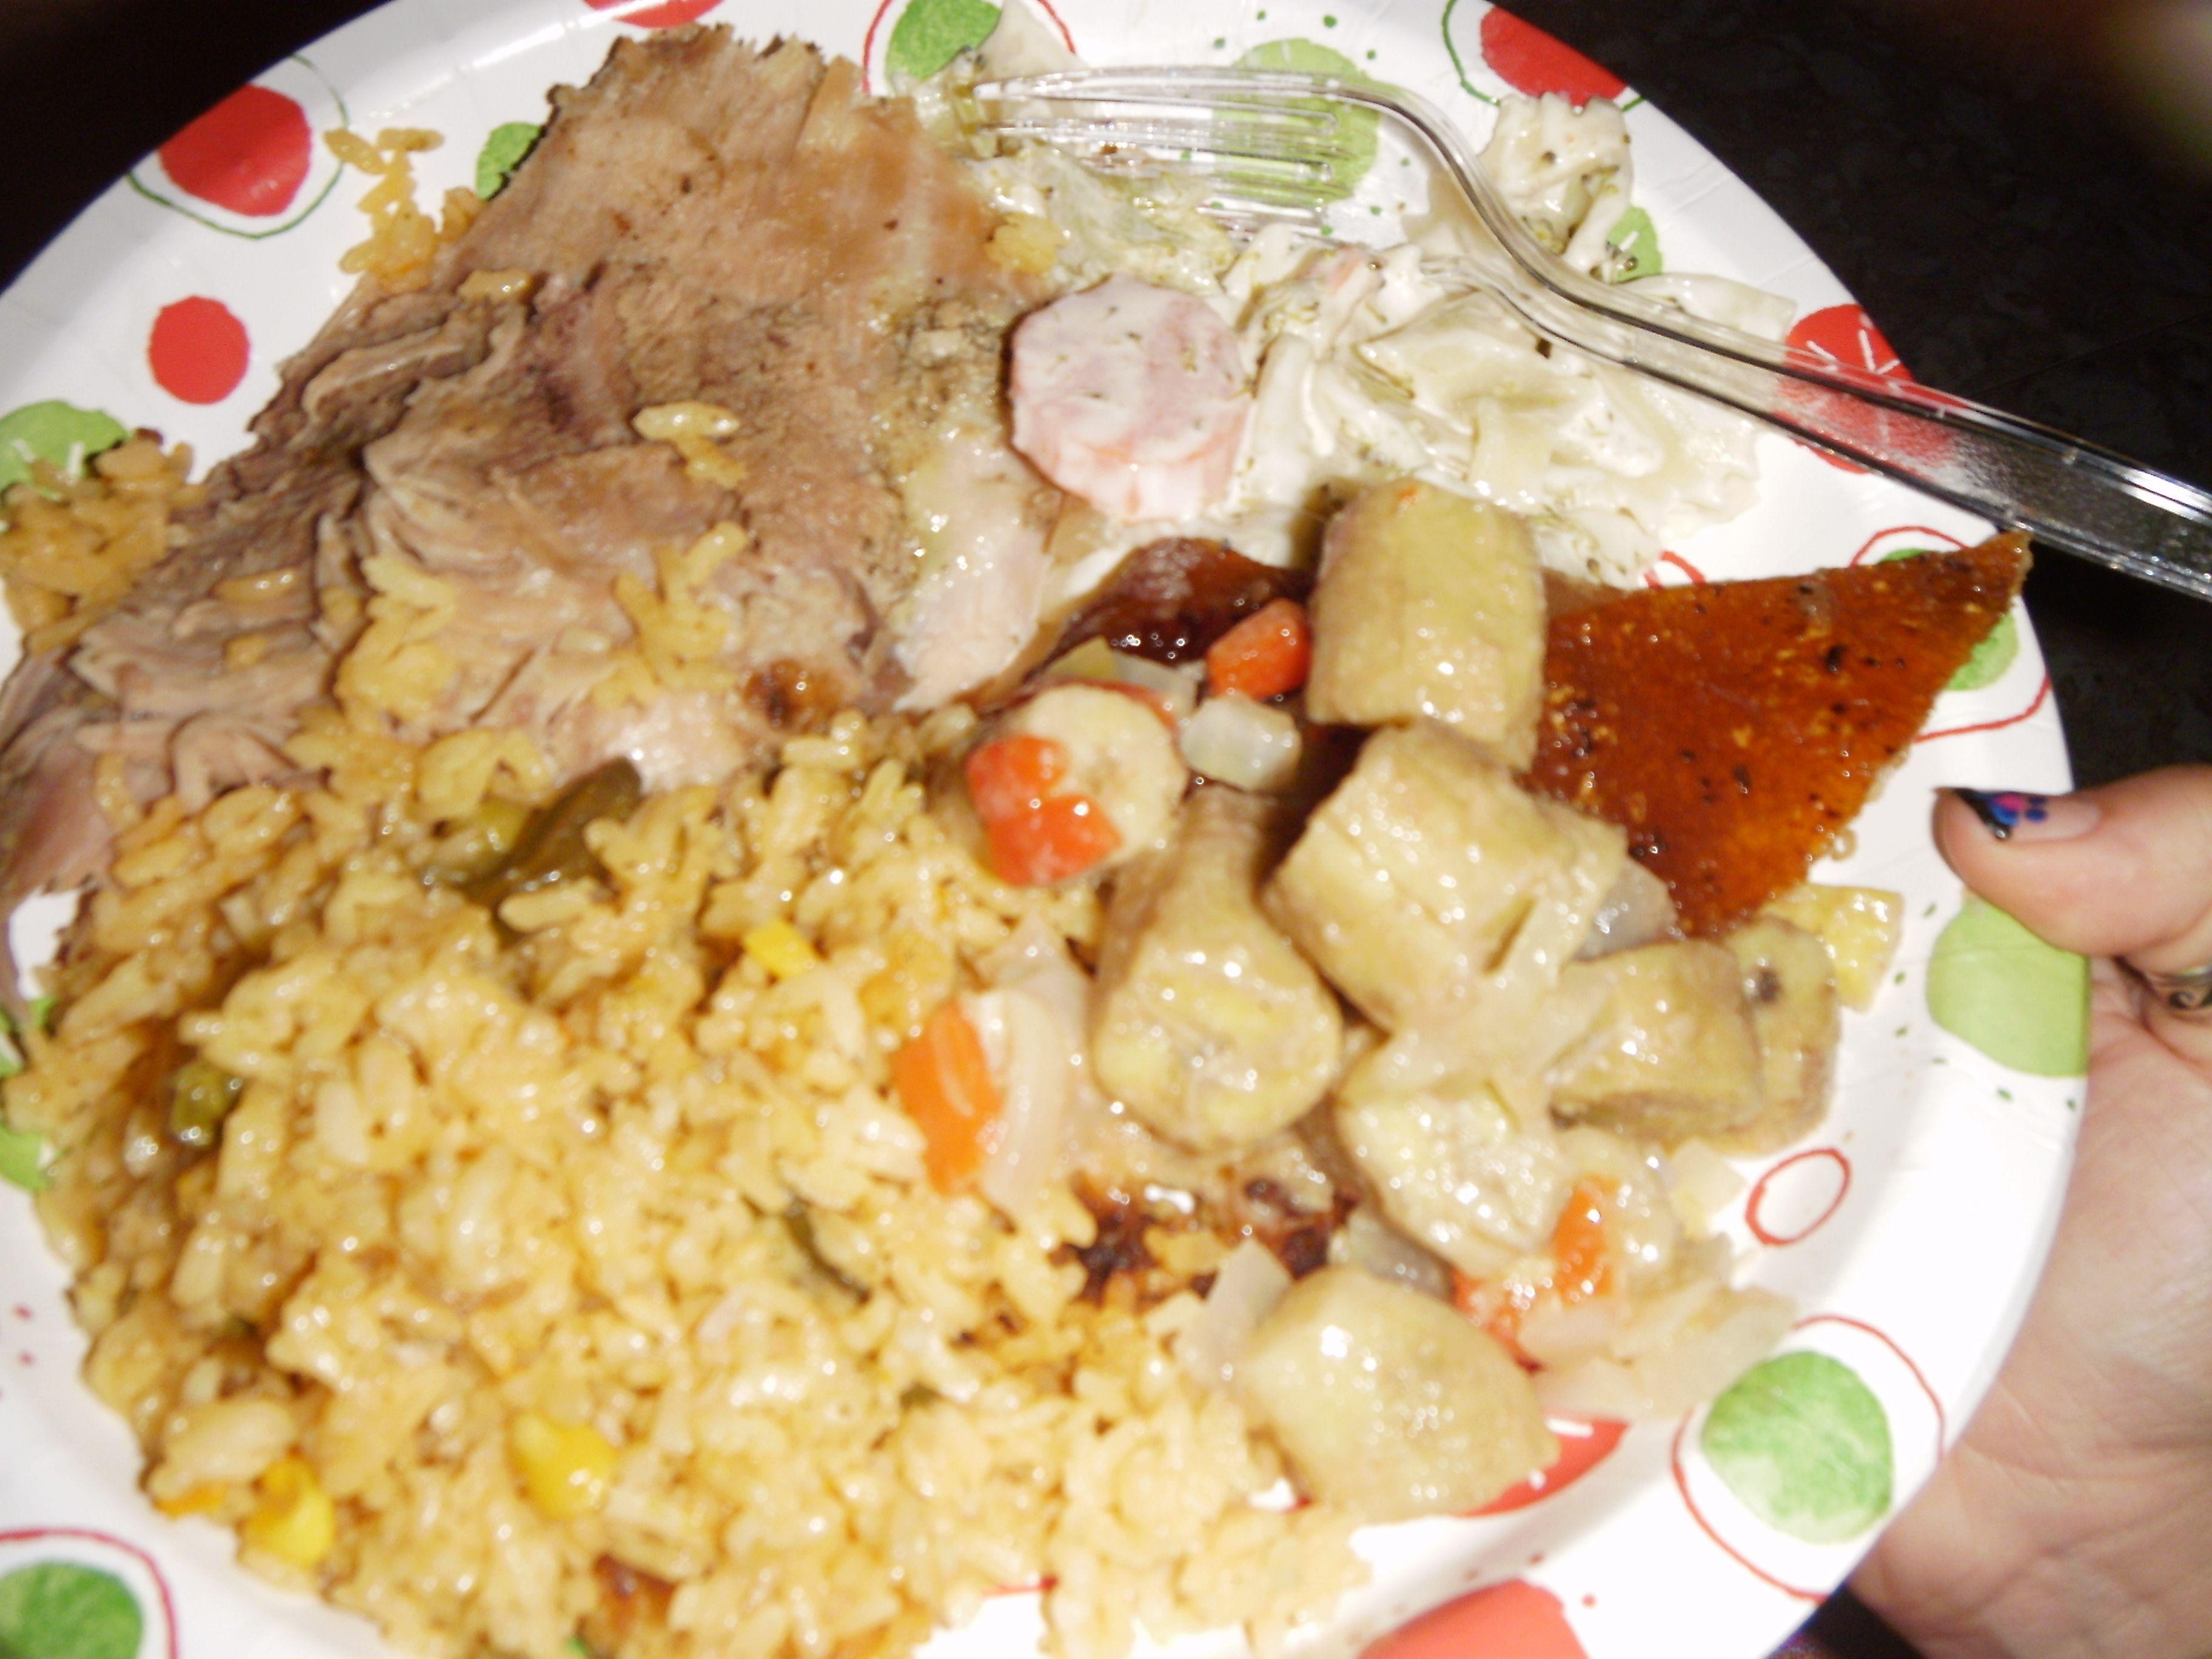 puerto rican christmas food - Puerto Rican Christmas Food